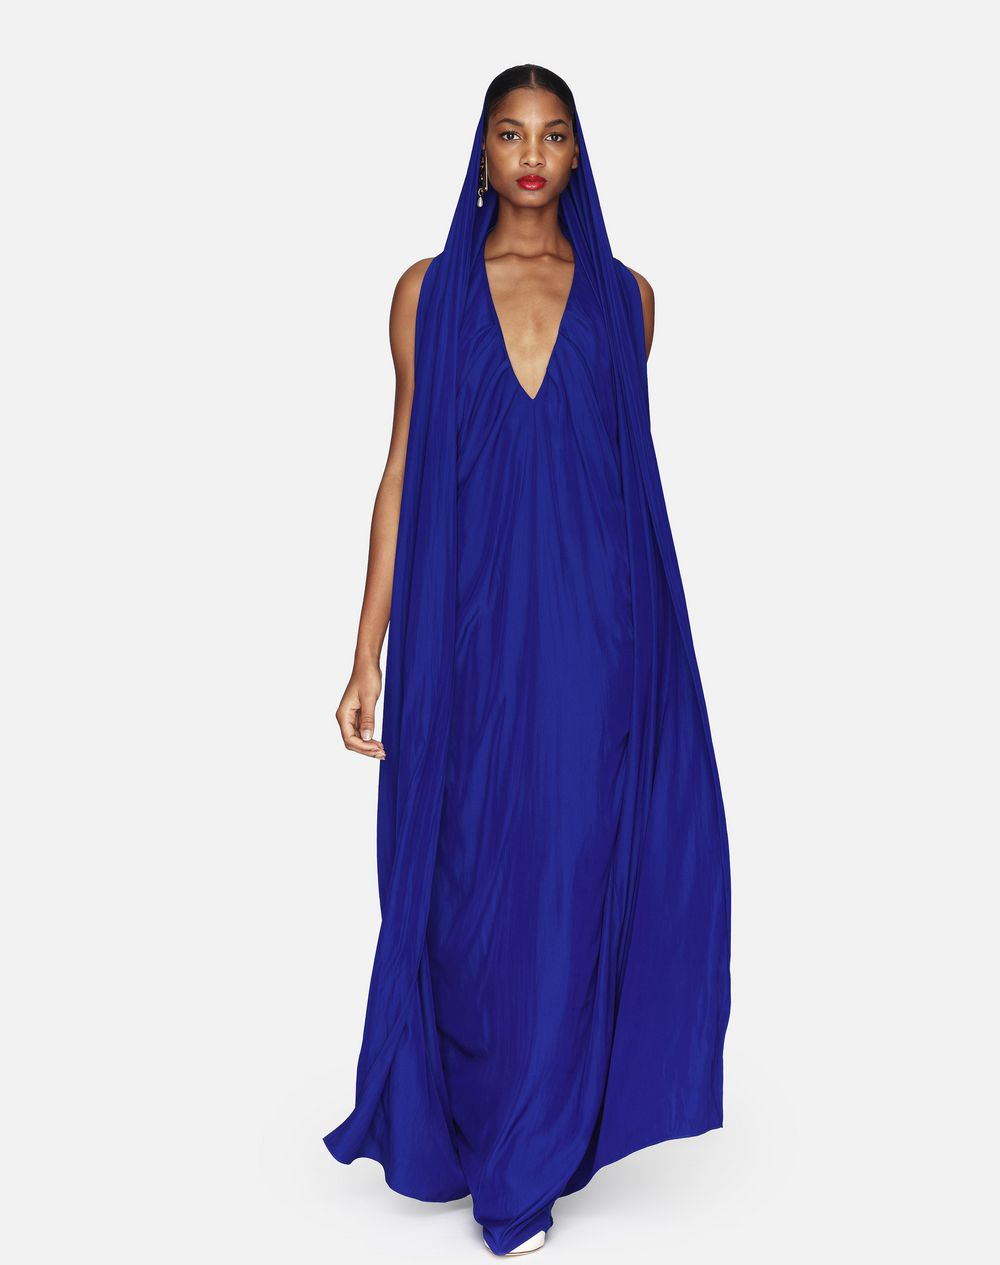 LONG SAPPHIRE DRESS - Lanvin